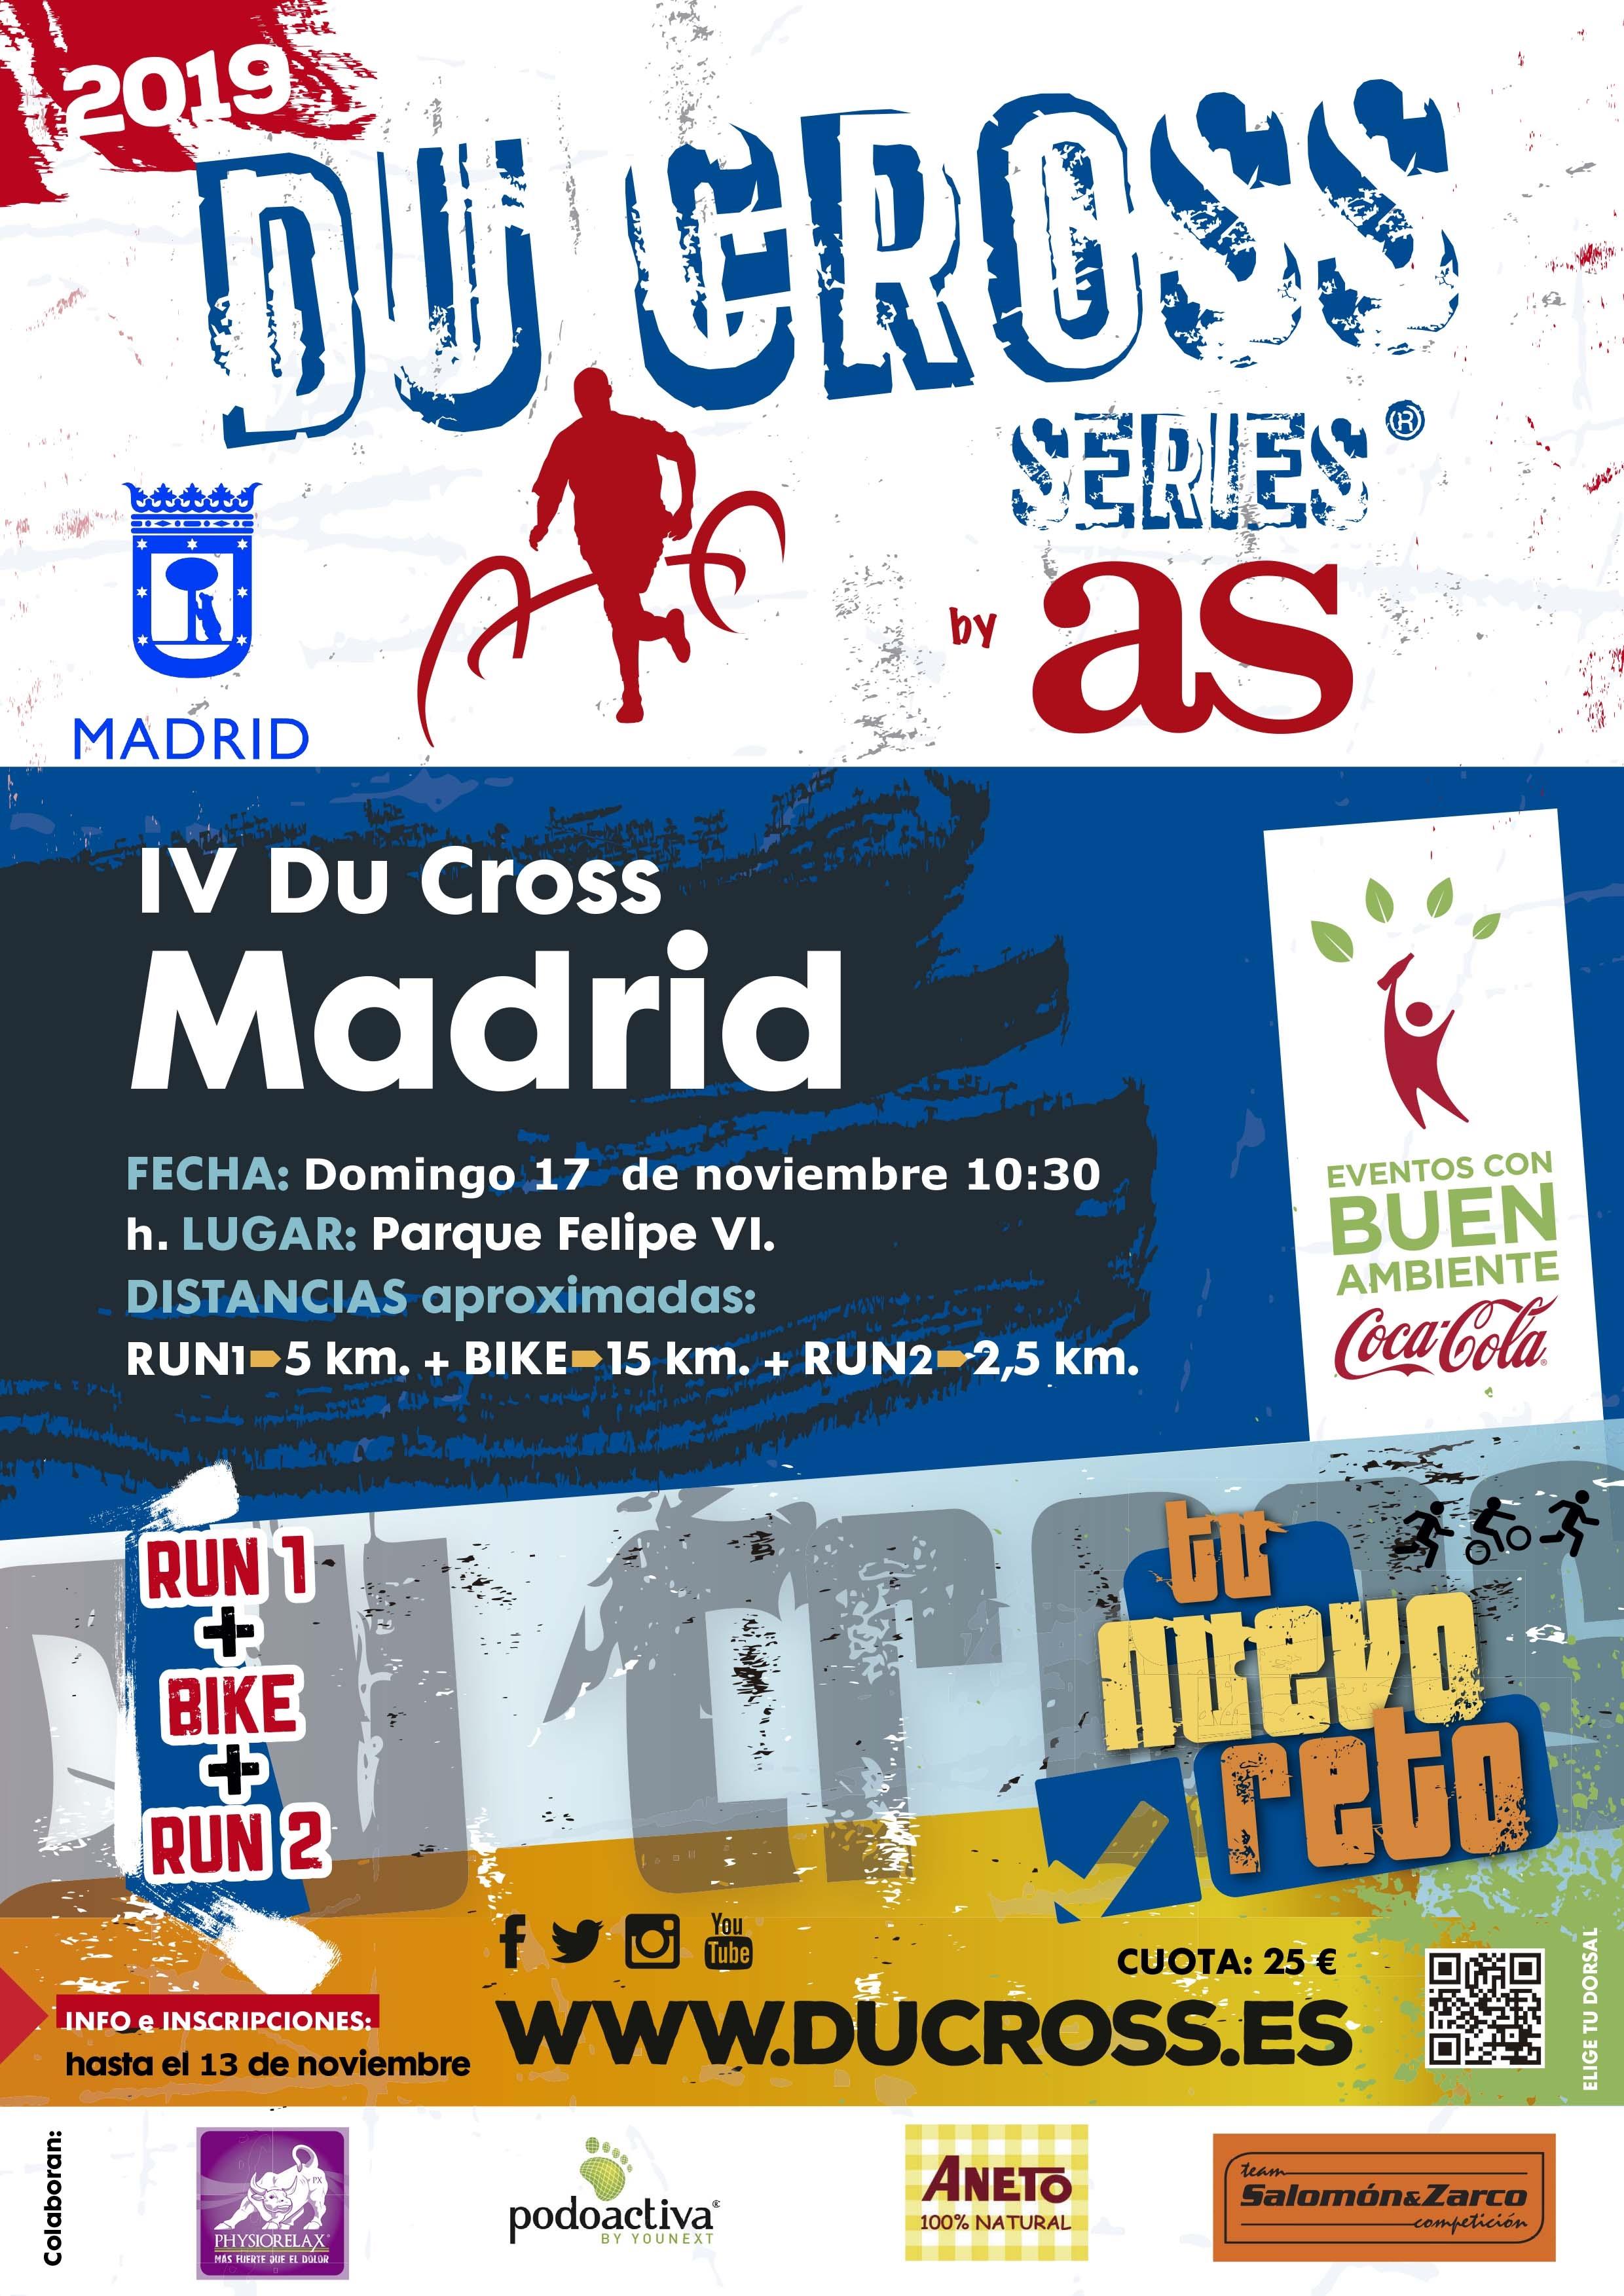 Du Cross Events